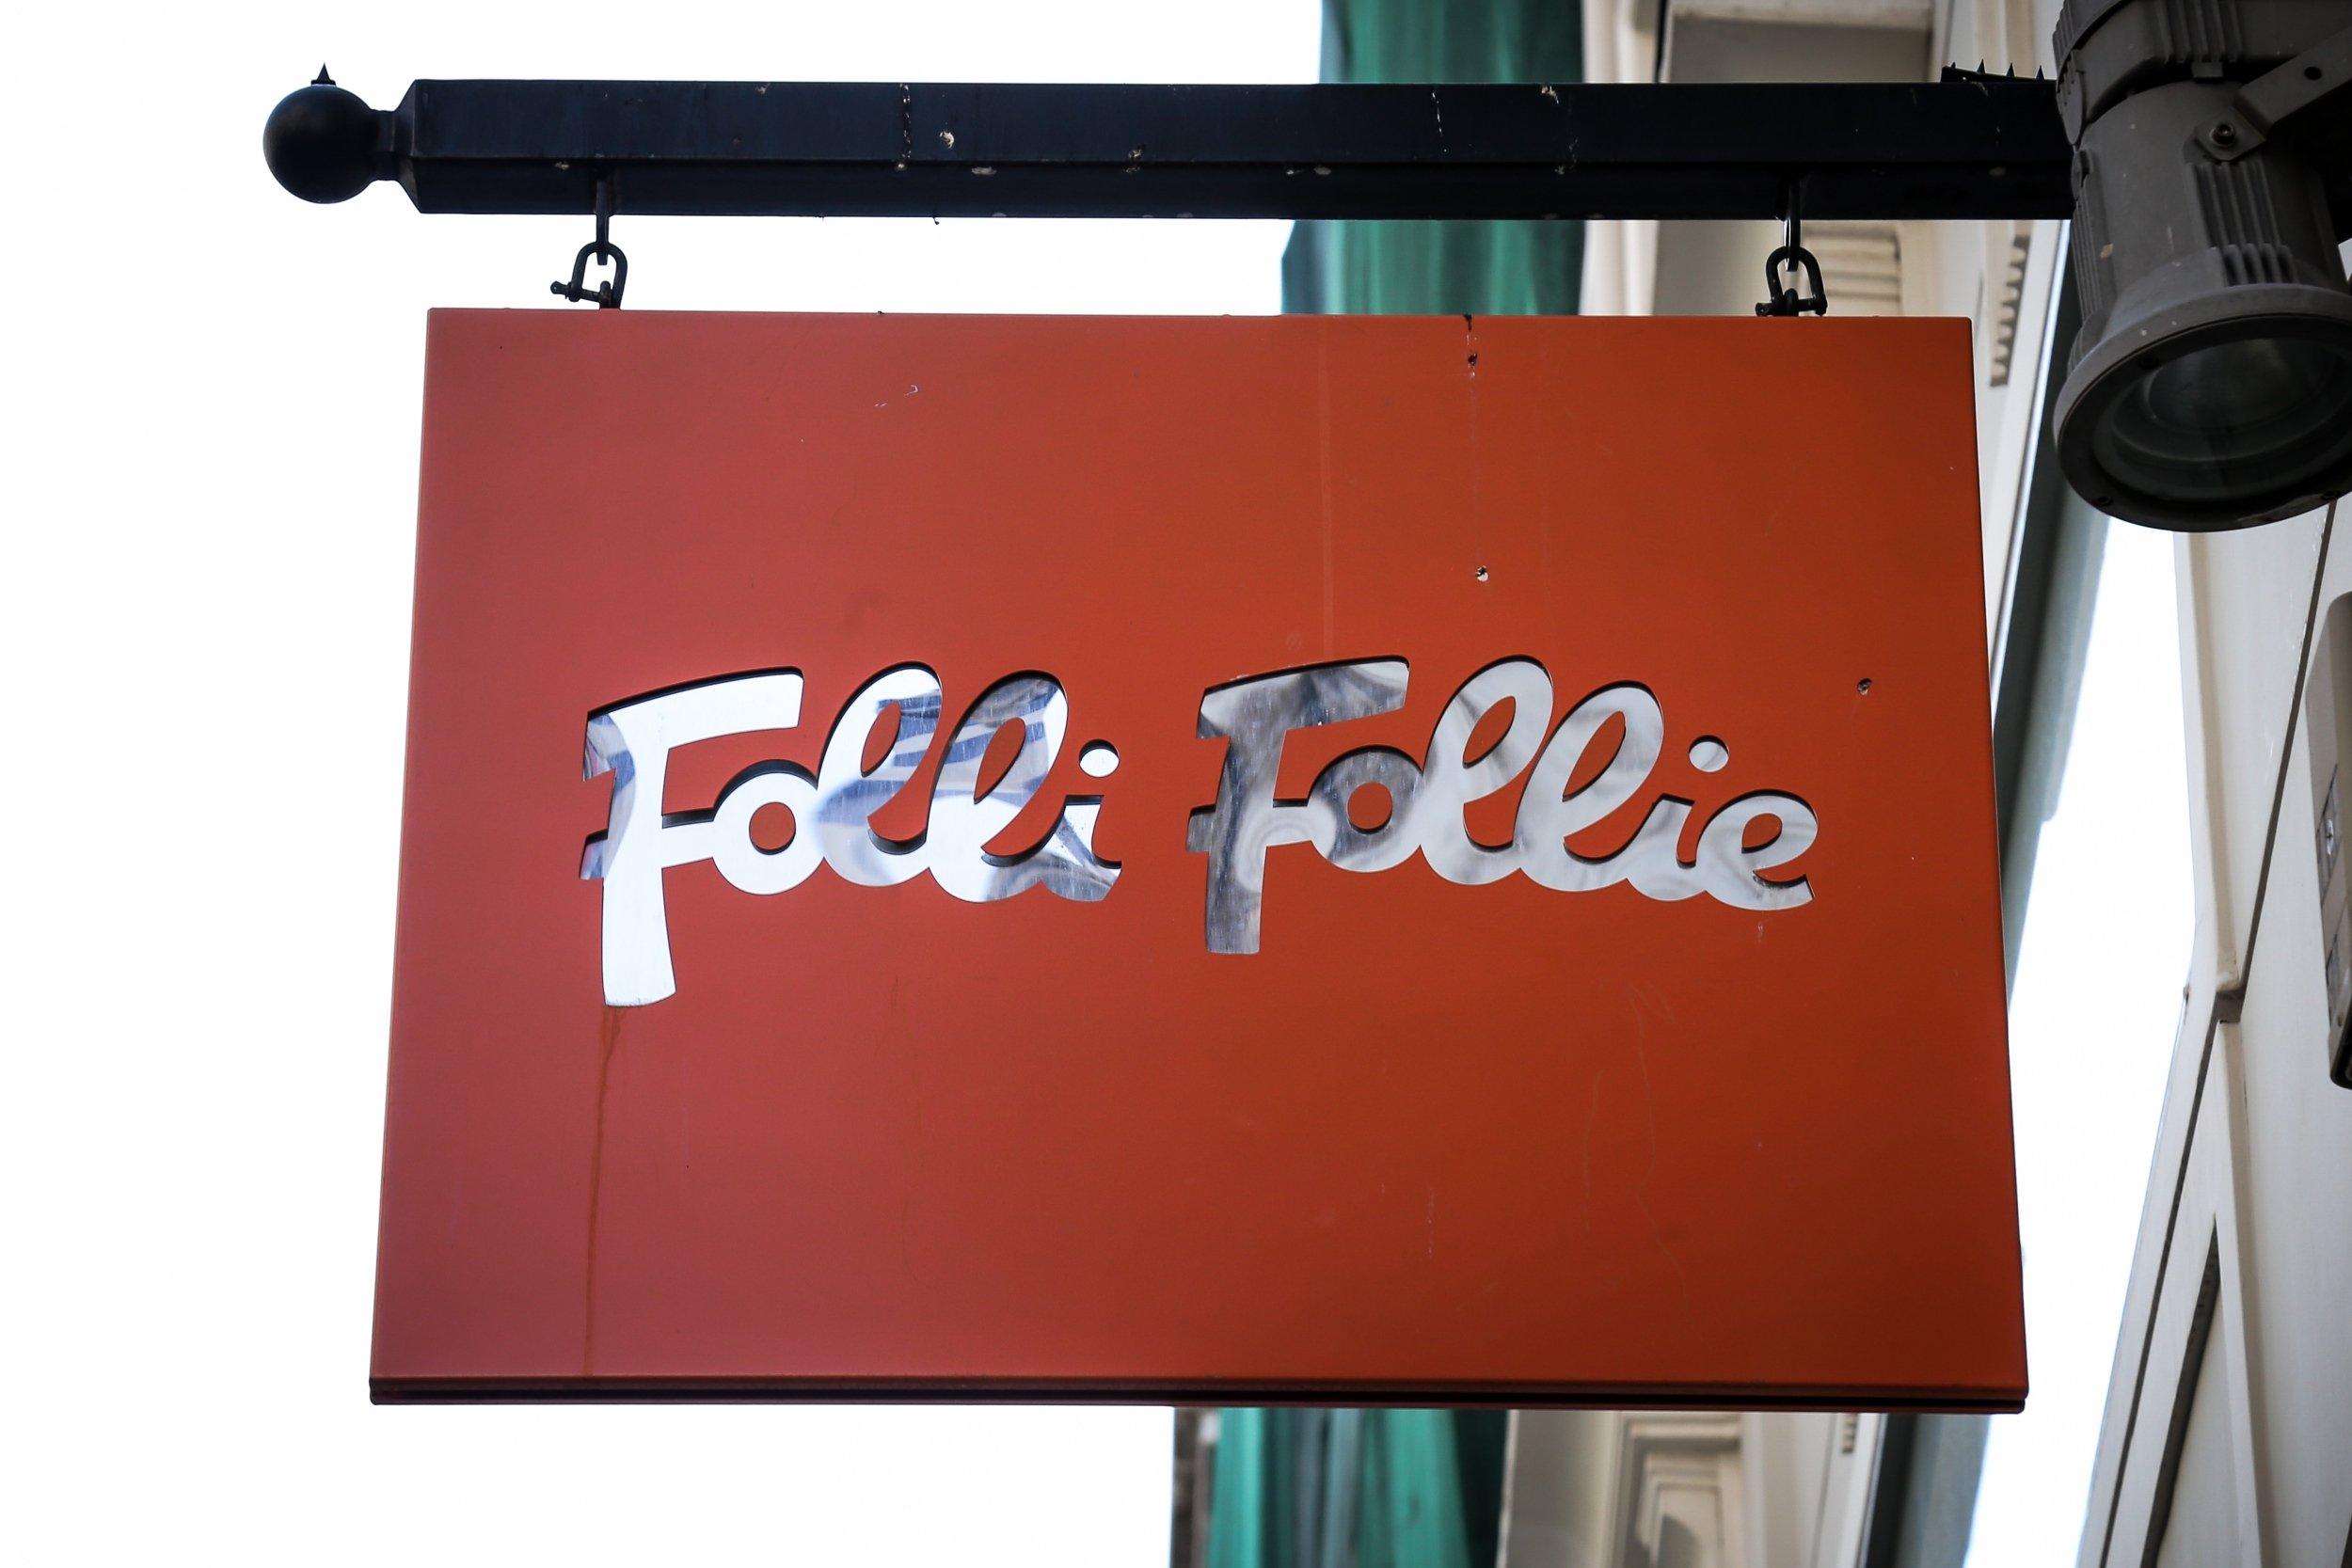 "Folli Follie: Νέο εσωτερικό mail ακουμπάει Μαξίμου και μιλάει για ""ενημέρωση"" του (τότε) πρωθυπουργού"